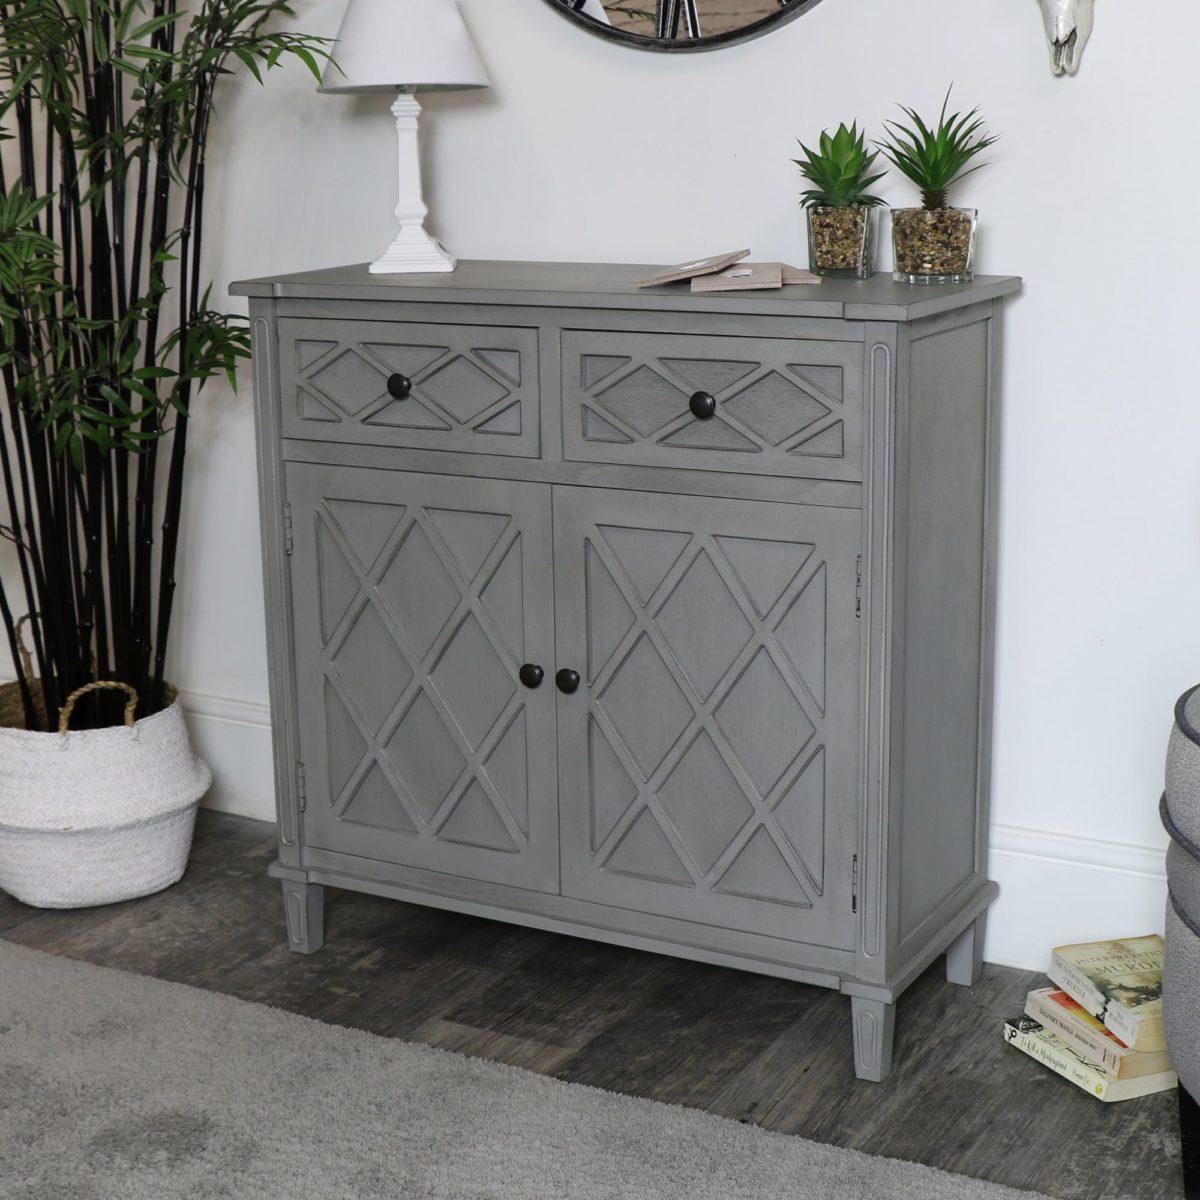 19melody-maison_grey-sideboard-storage-unit-venice-range-1200x1200.jpg